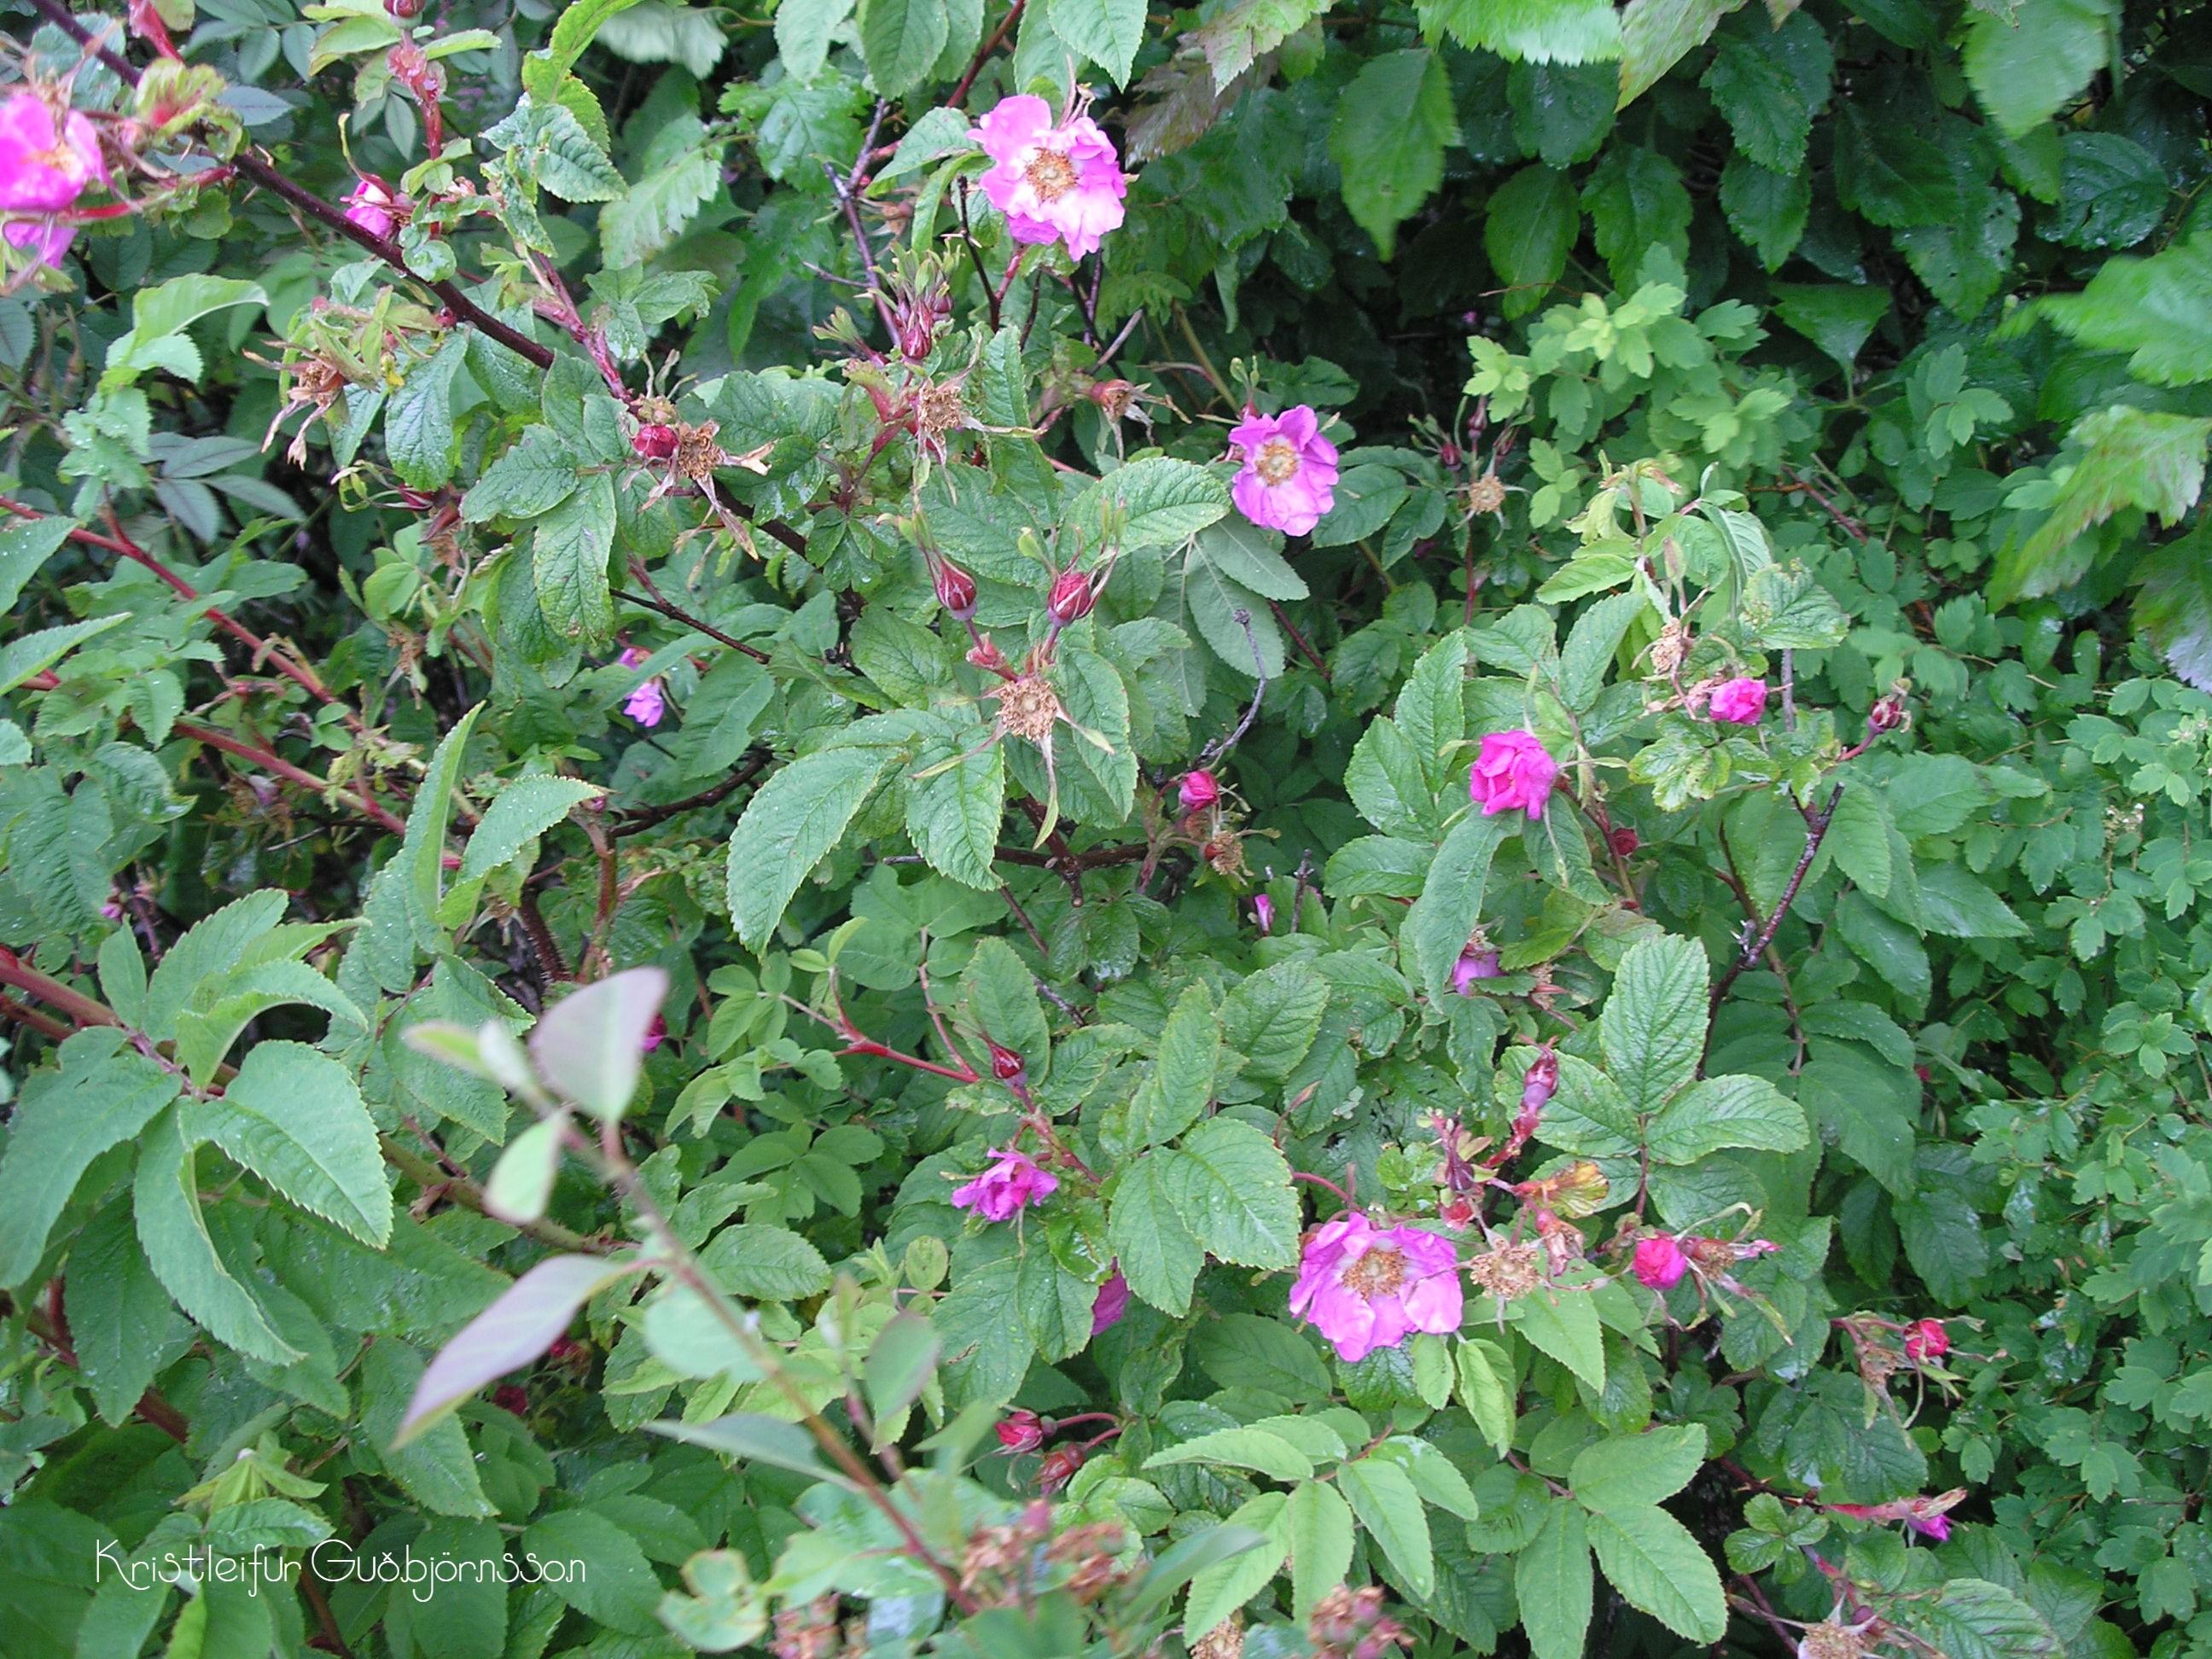 Rosa amblyotis